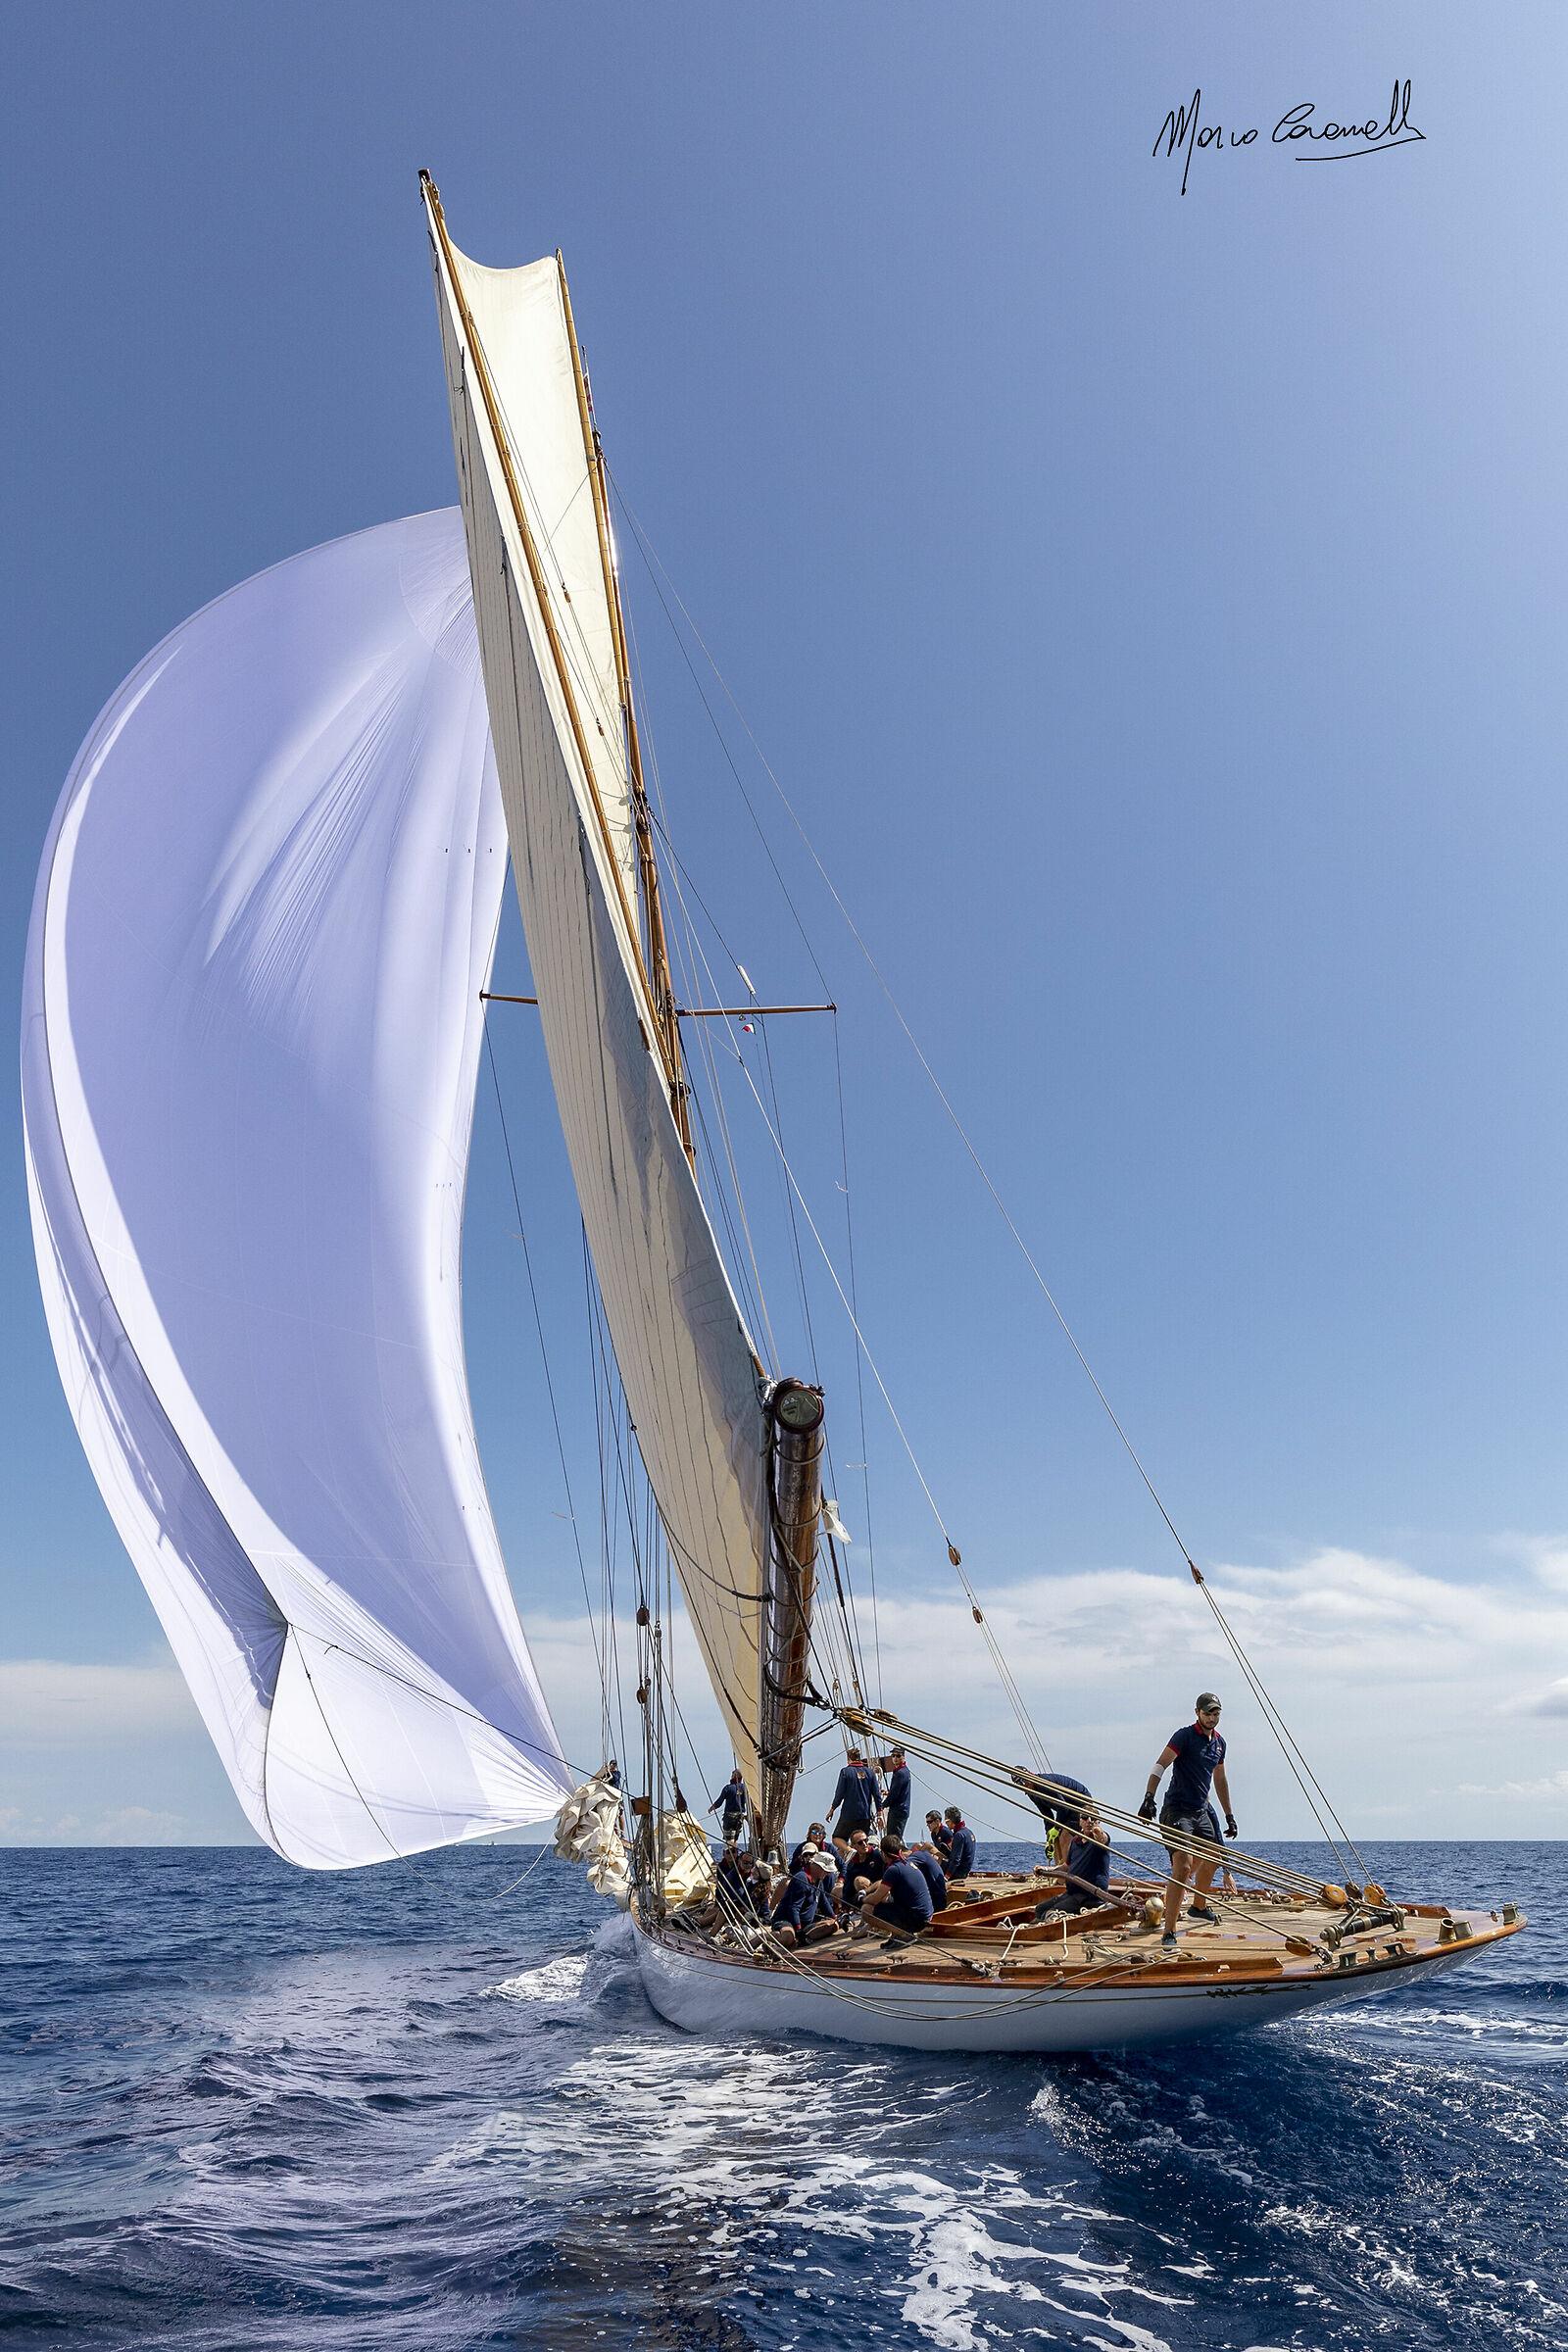 Sails ...